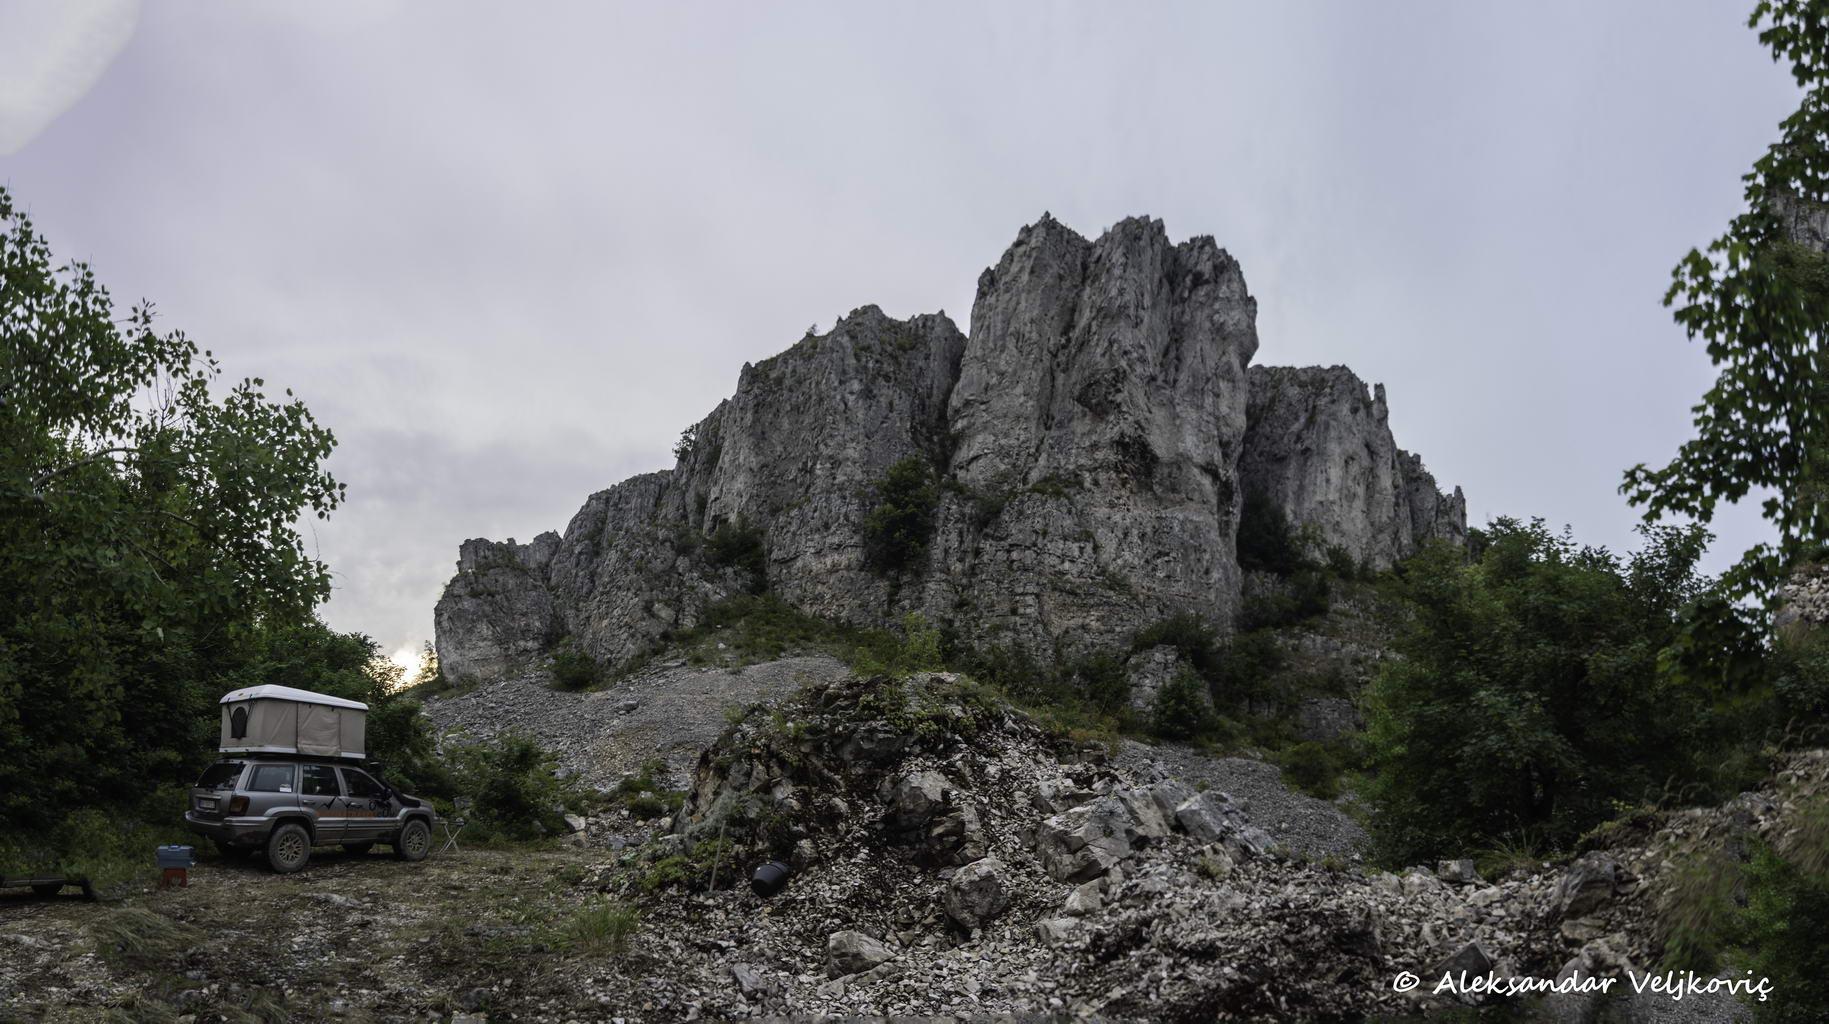 Under the Mikulj rock